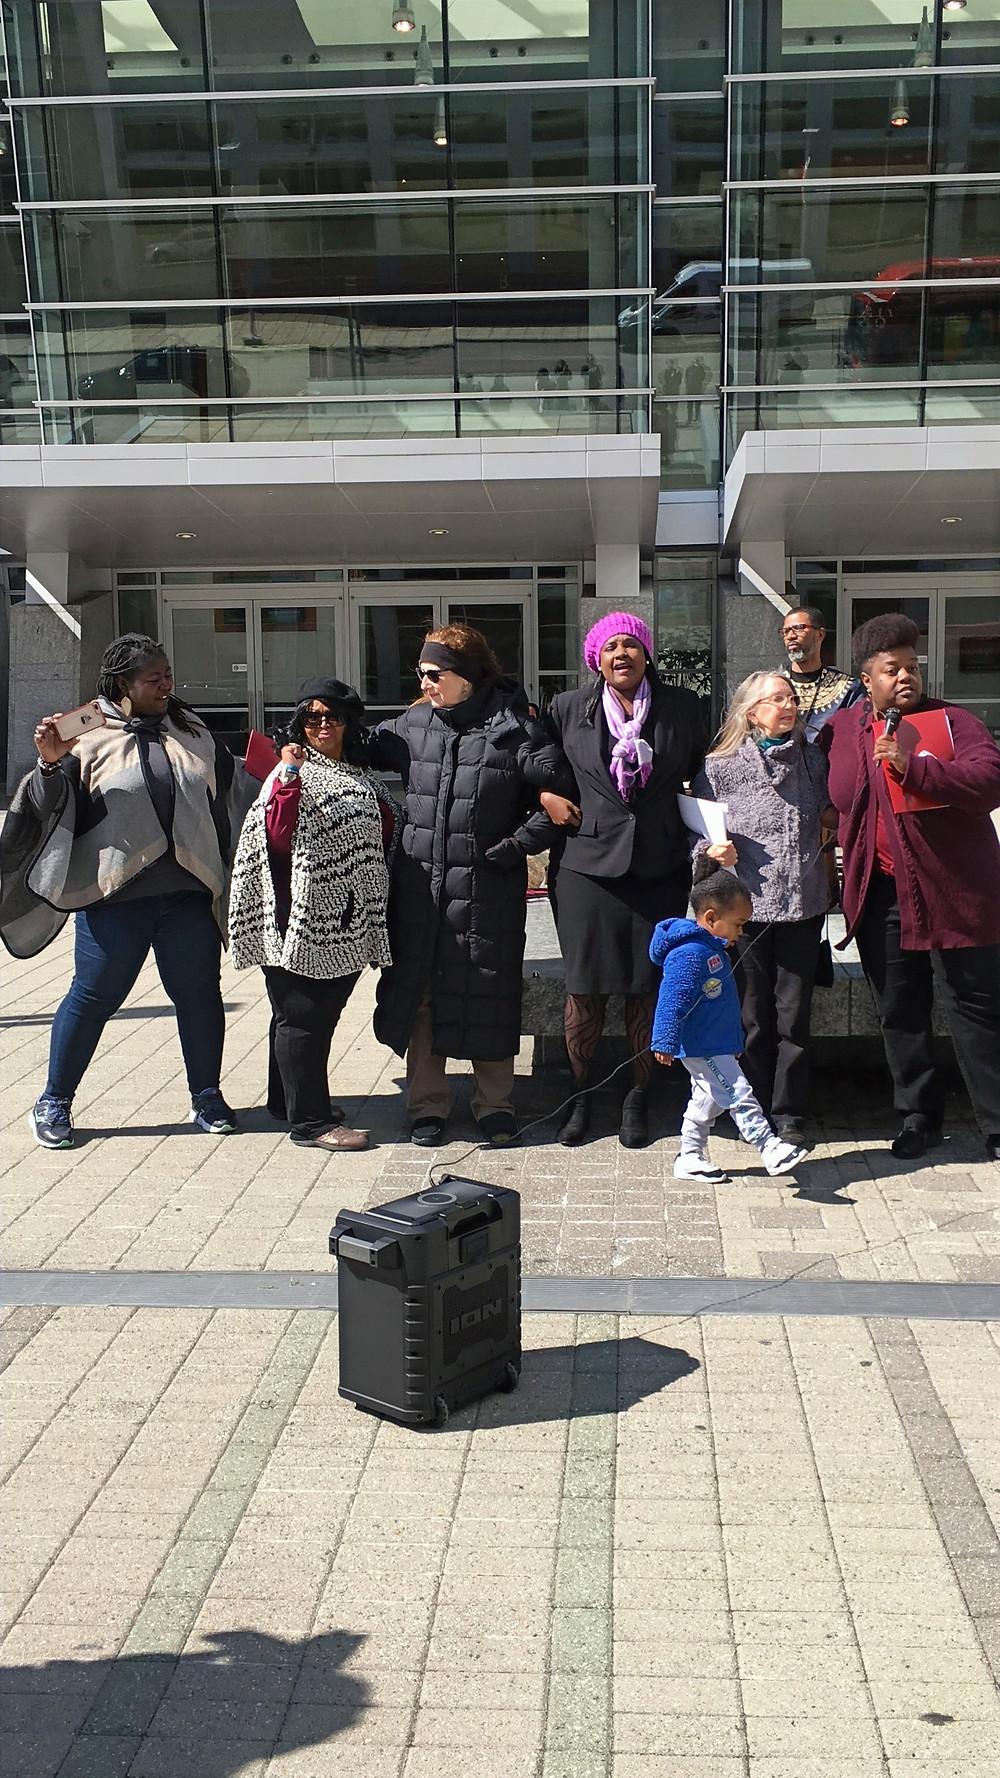 Pictured from left to right: Yolanda Taylor, Wanda Gilbert-Coker, Stefanie Mendell, Barbara Smalley-McMann, and Wanda Hunter